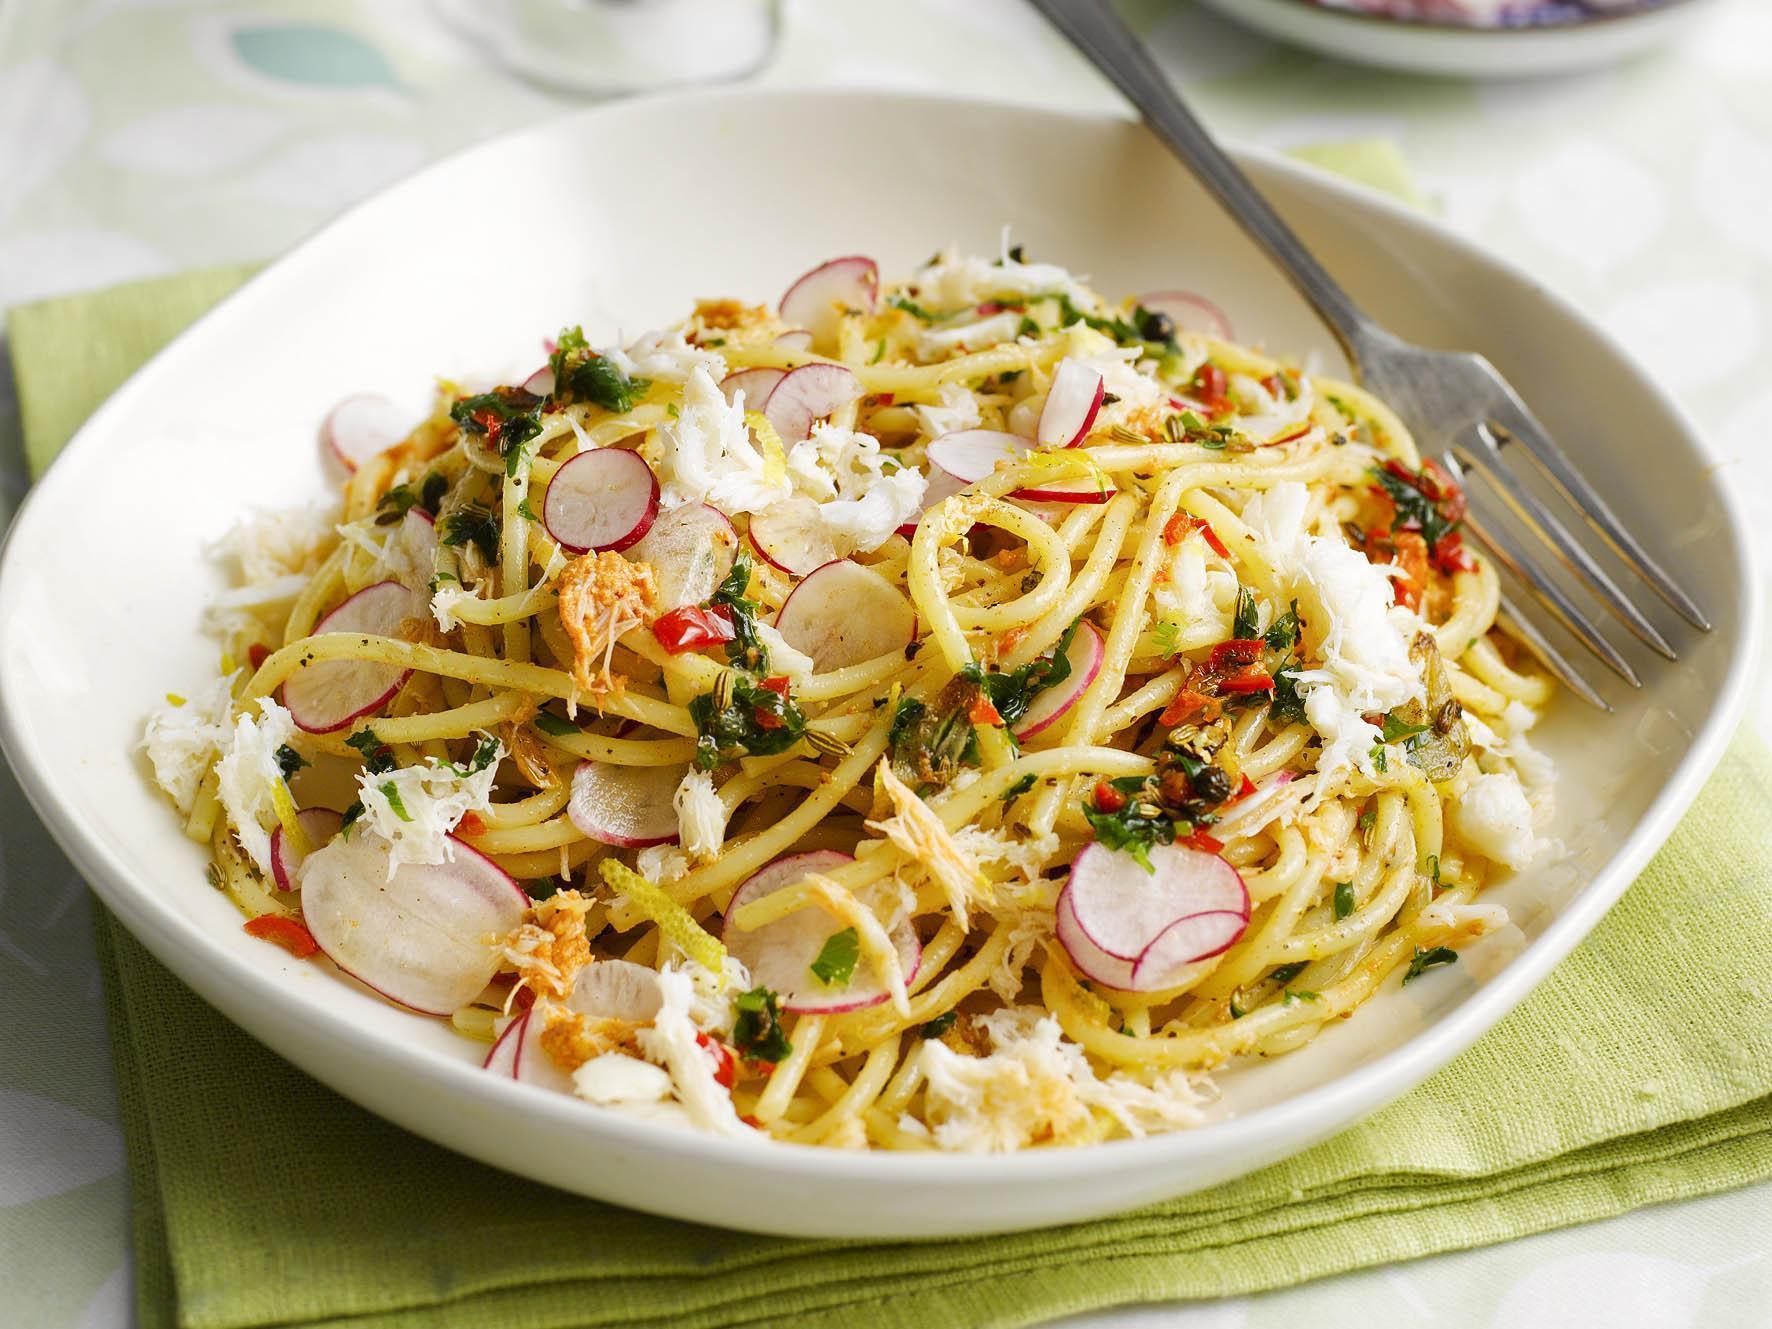 How to make spaghetti with crab, lemon, chilli, parsley and radish shavings 1